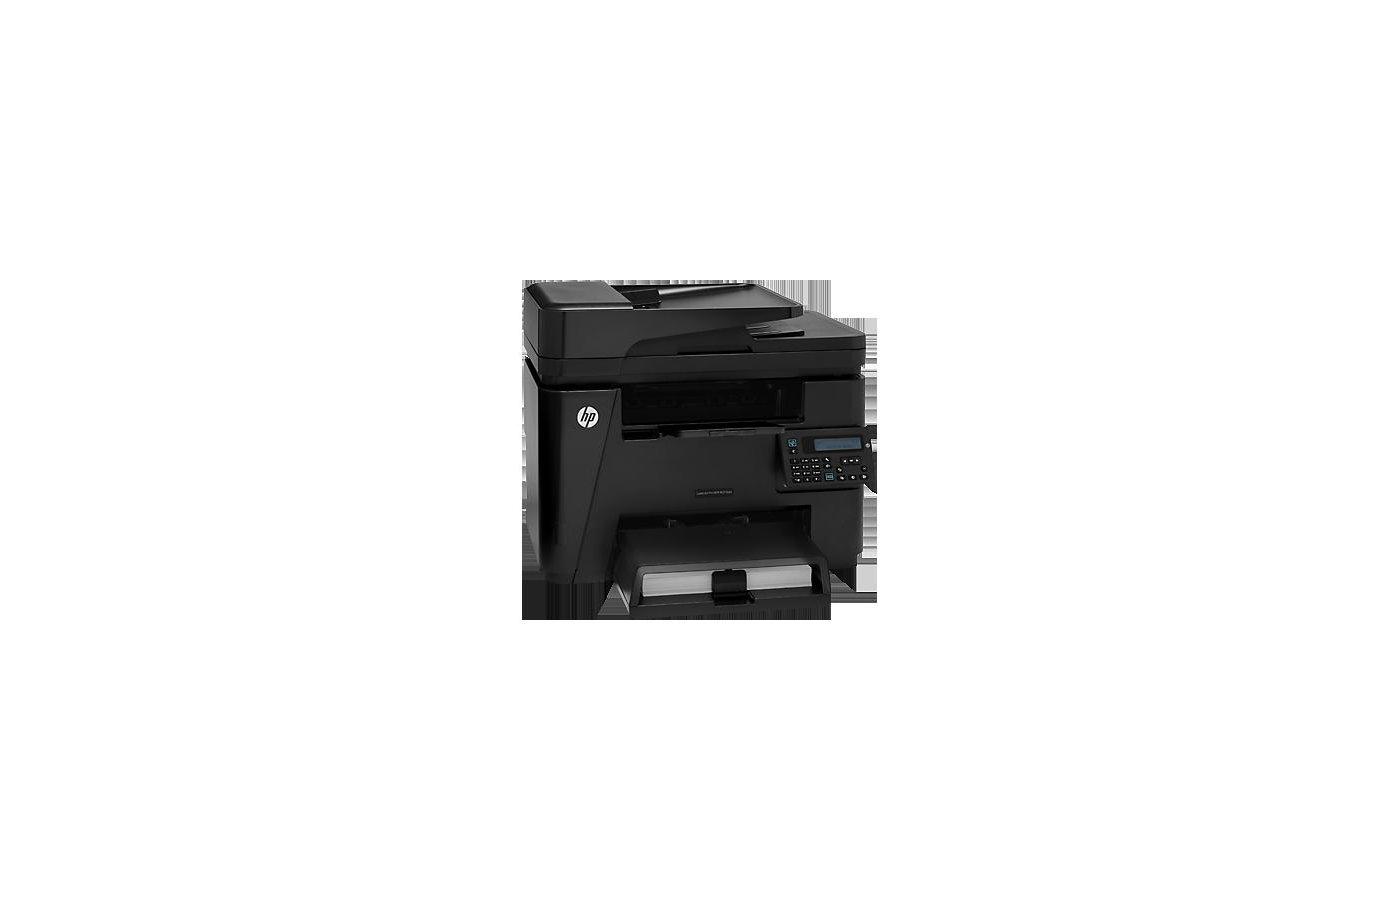 МФУ HP LaserJet Pro M225rdn /CF486A/